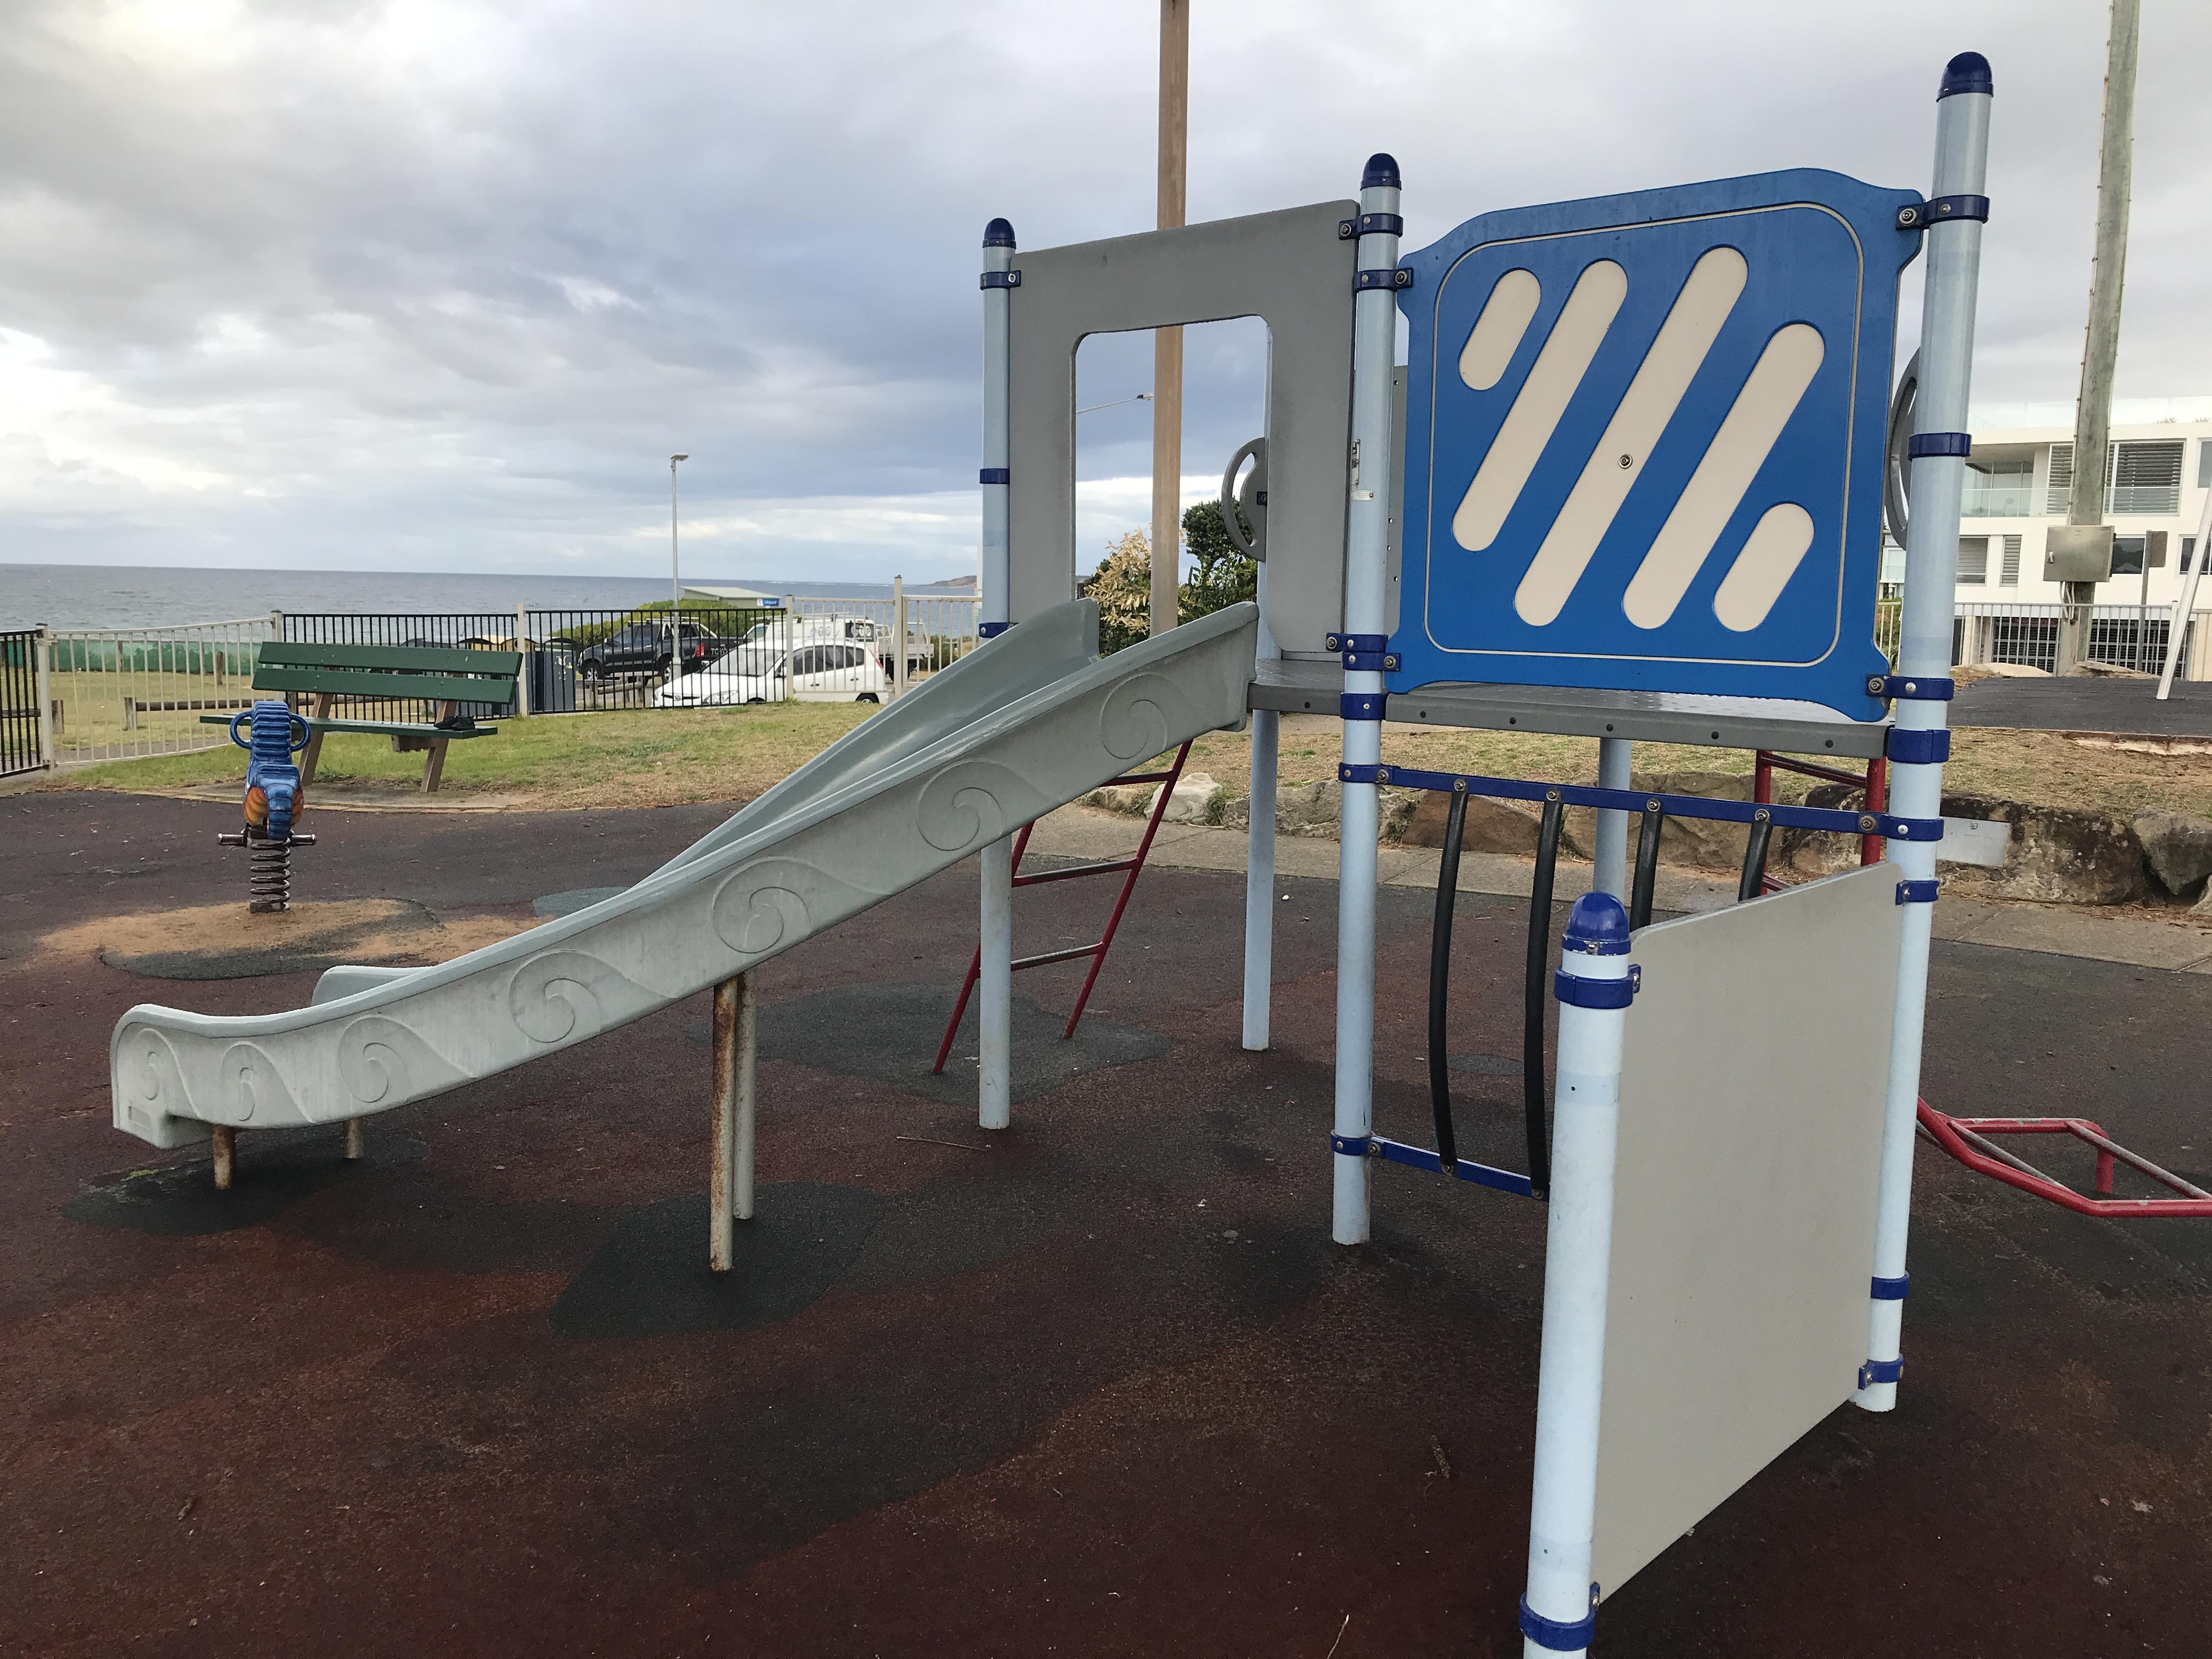 Birdwood Park Playground